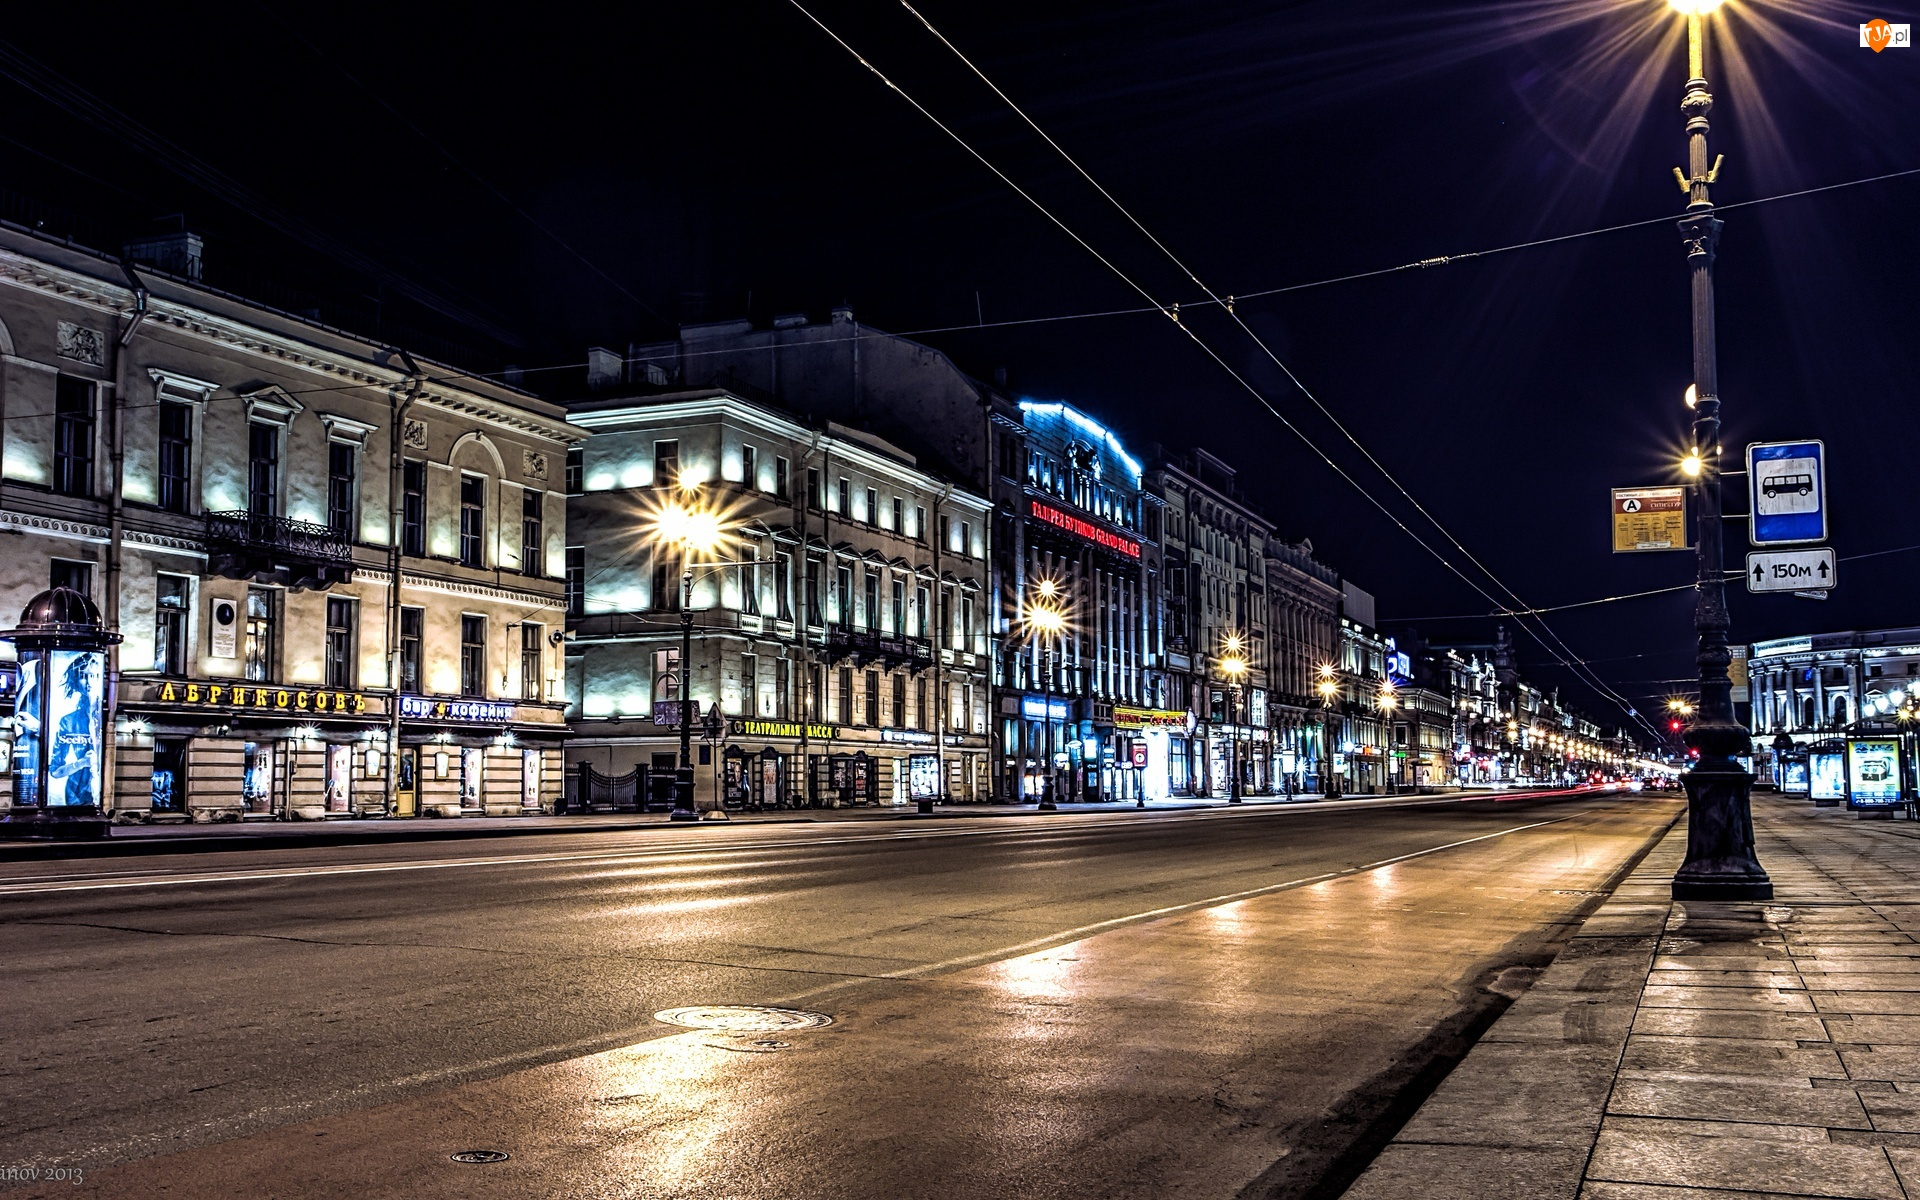 Rosja, Ulica, Latarnie, Budynki, Petersburg